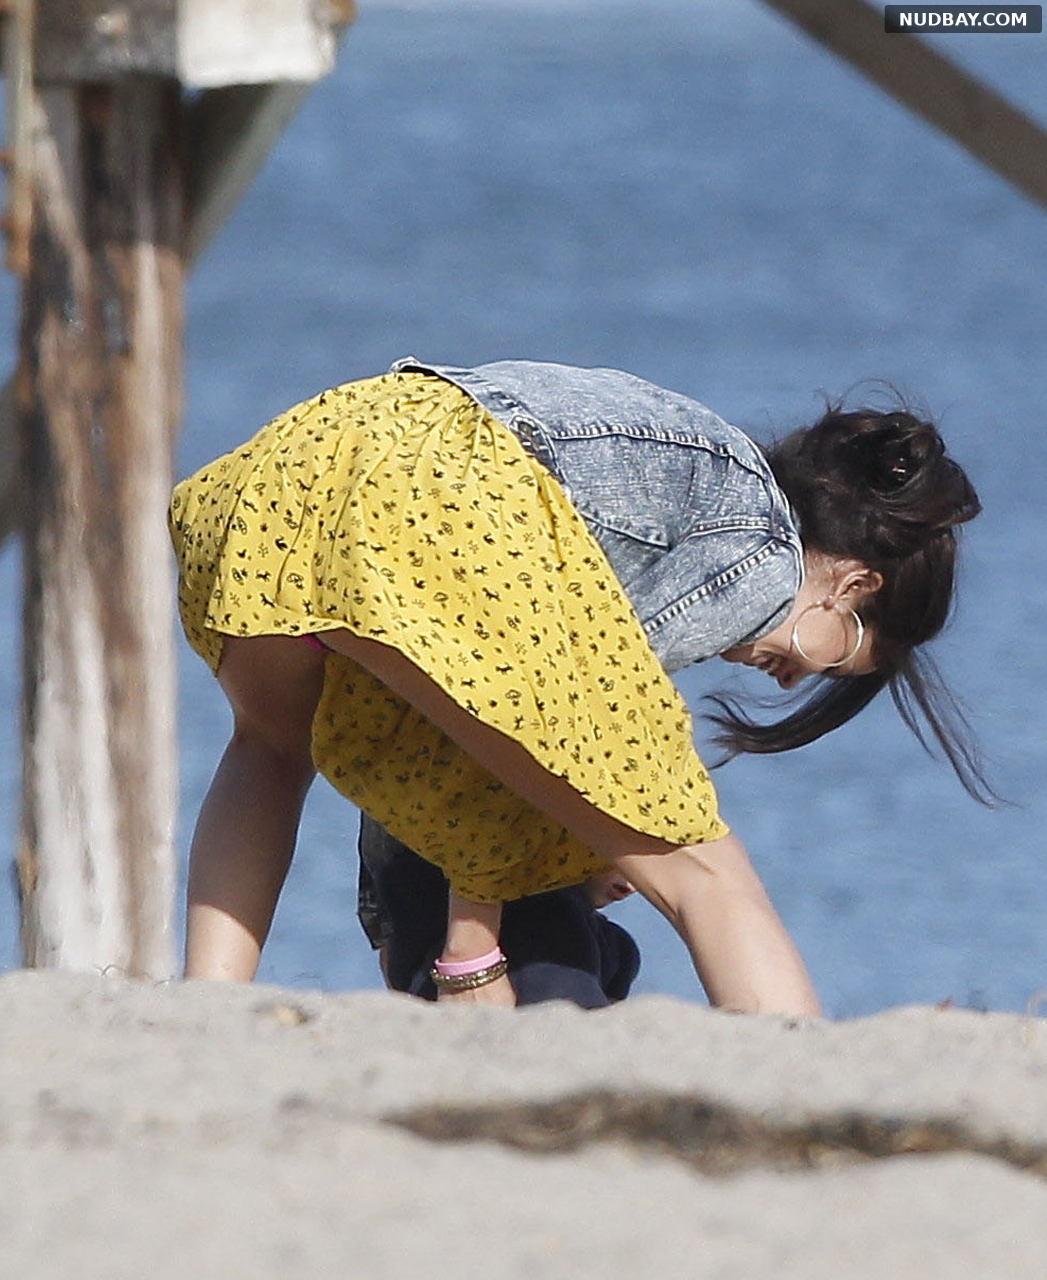 Selena Gomez upskirt on the beach Feb 17 2012